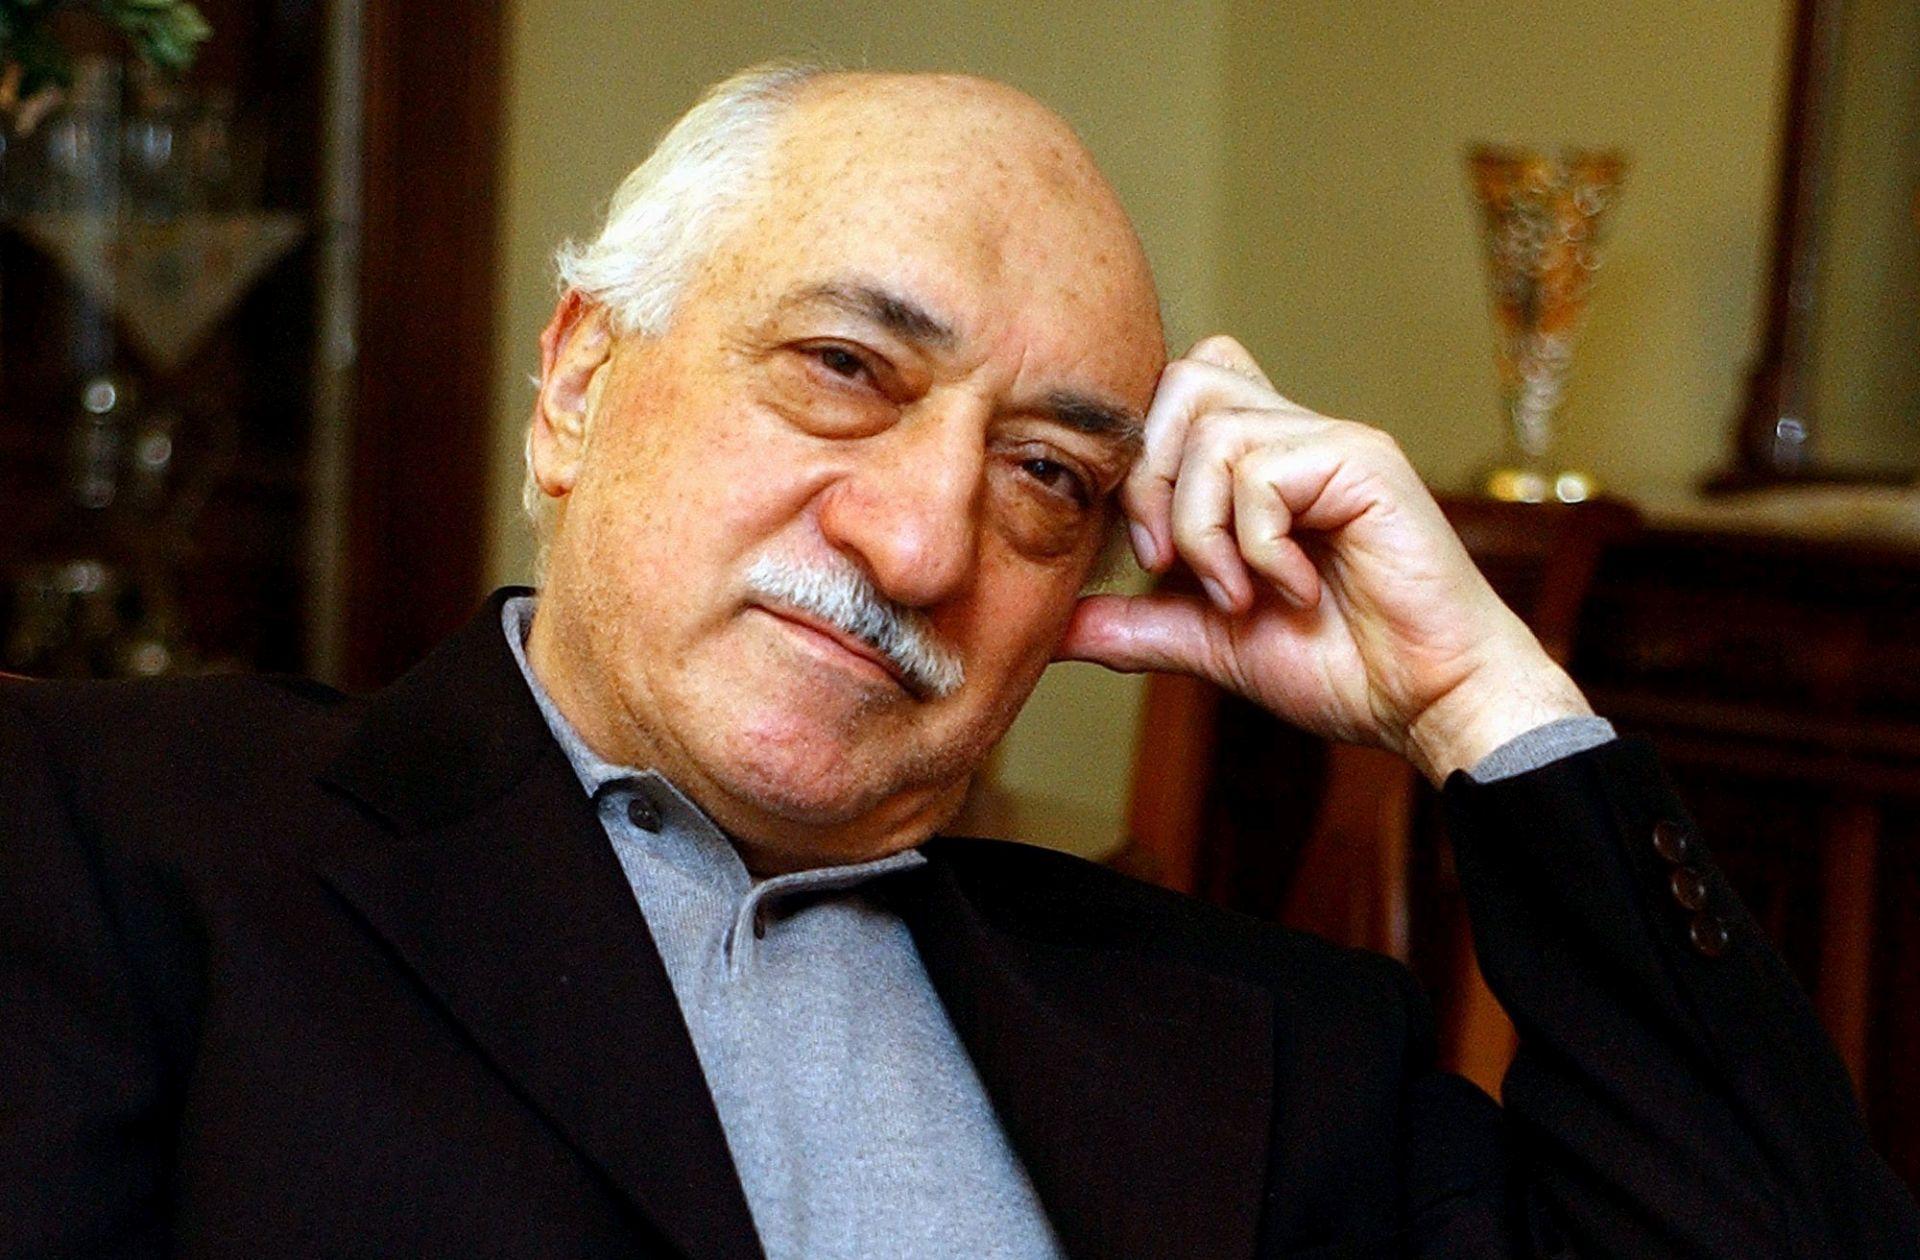 PRISTAO NA SURADNJU: Gulen traži međunarodnu istragu o puču